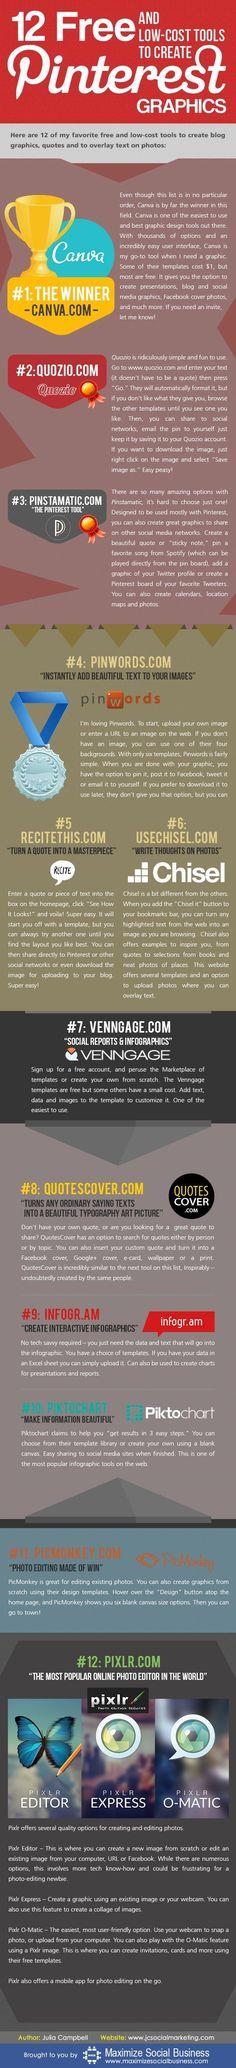 12 free and low-cost tools to create Pinterest graphics #Infografica #infographic, statistiche e spunti di riflessione. #diellegrafica